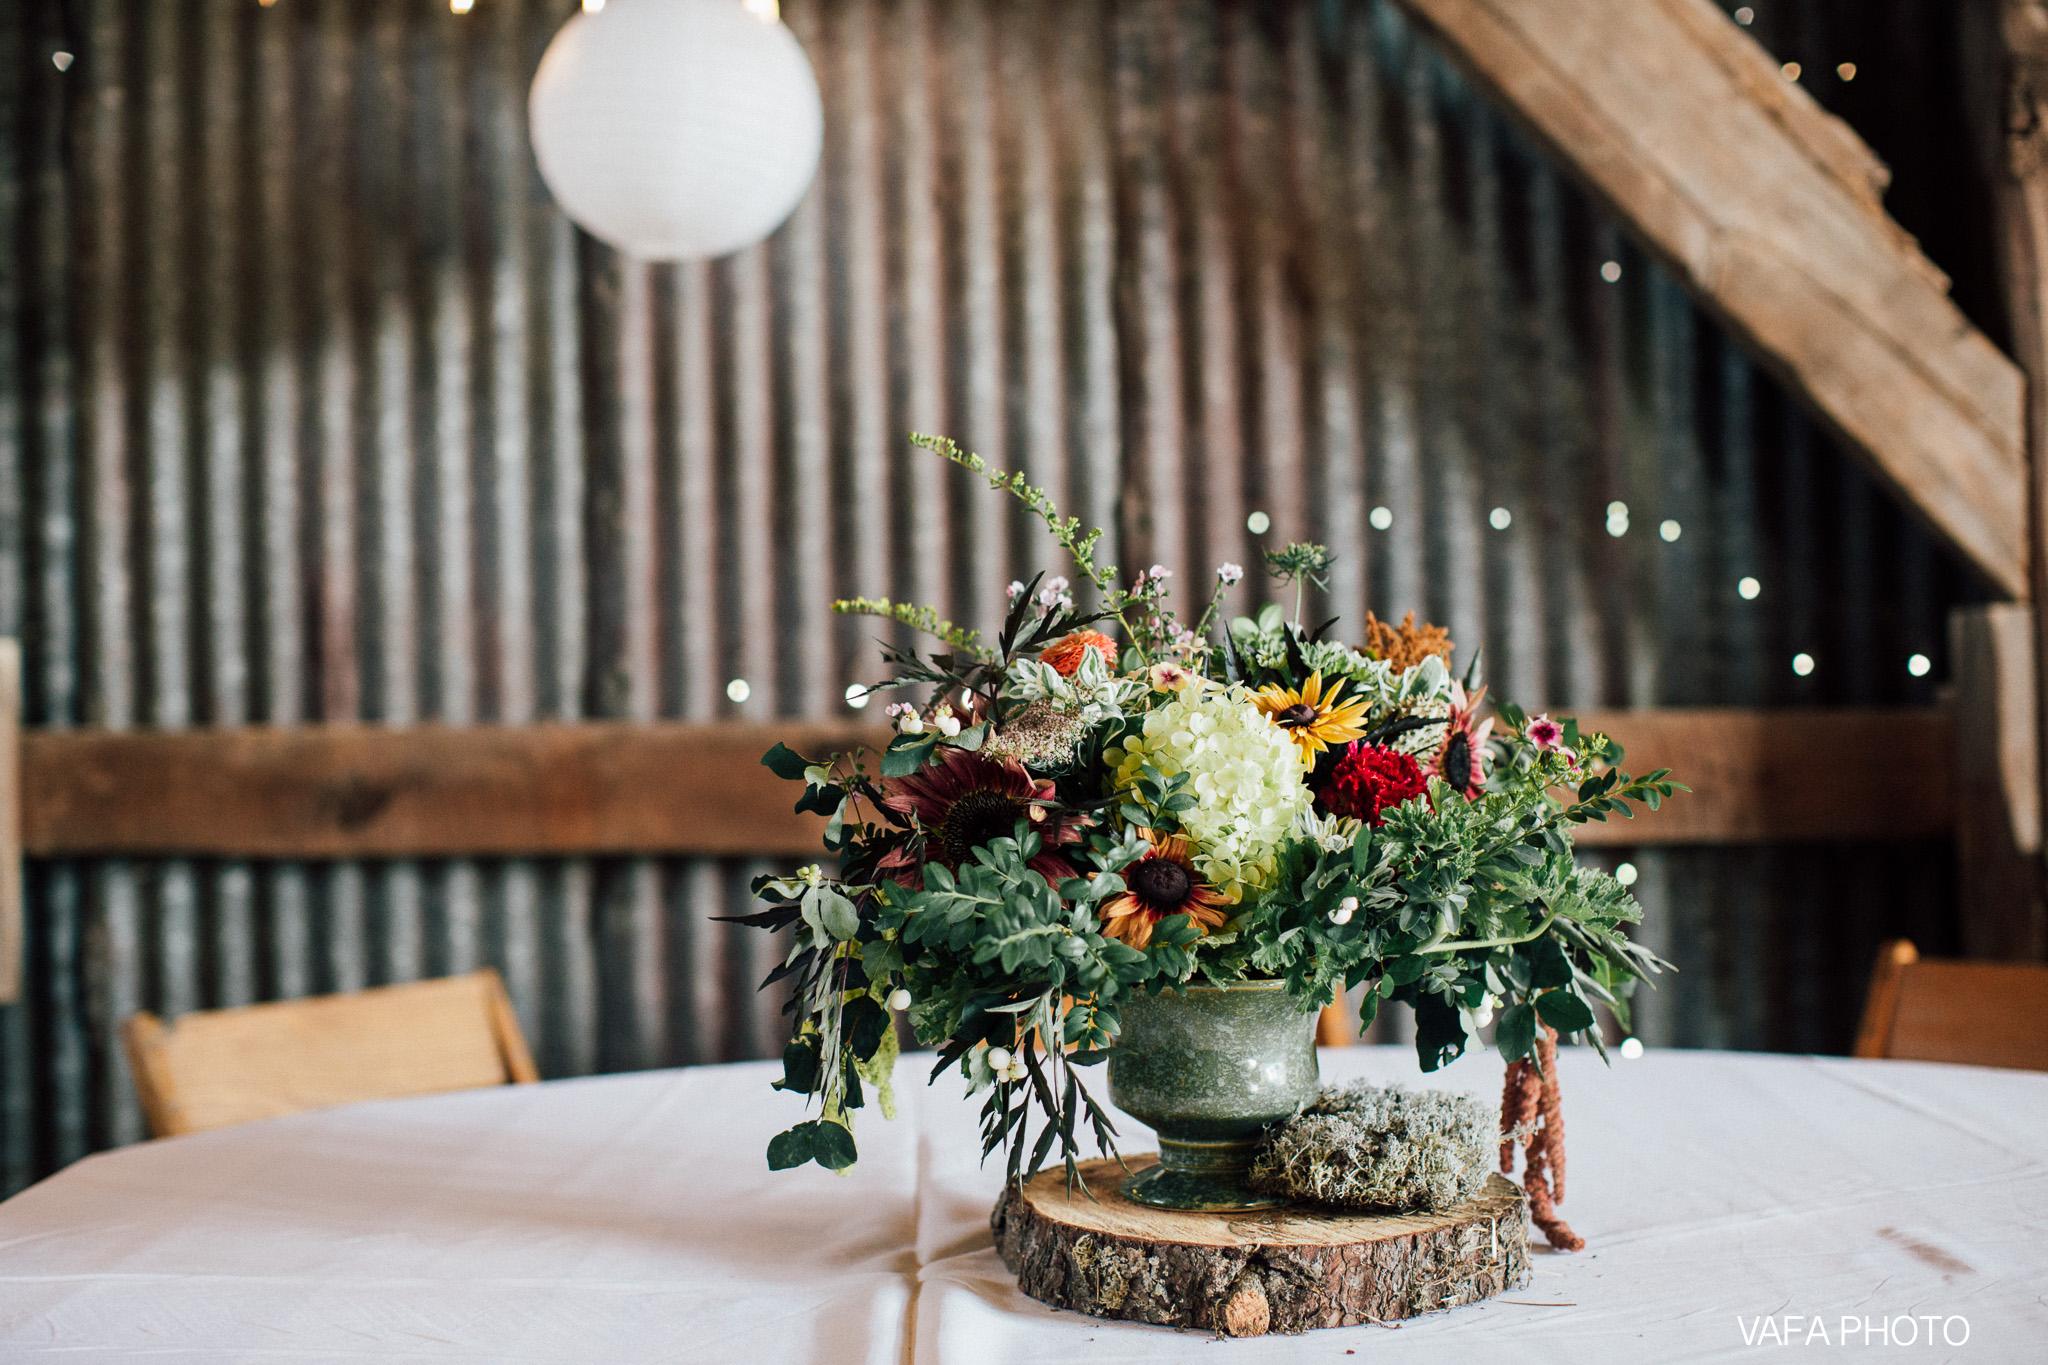 Belsolda-Farm-Wedding-Christy-Eric-Vafa-Photo-288.jpg